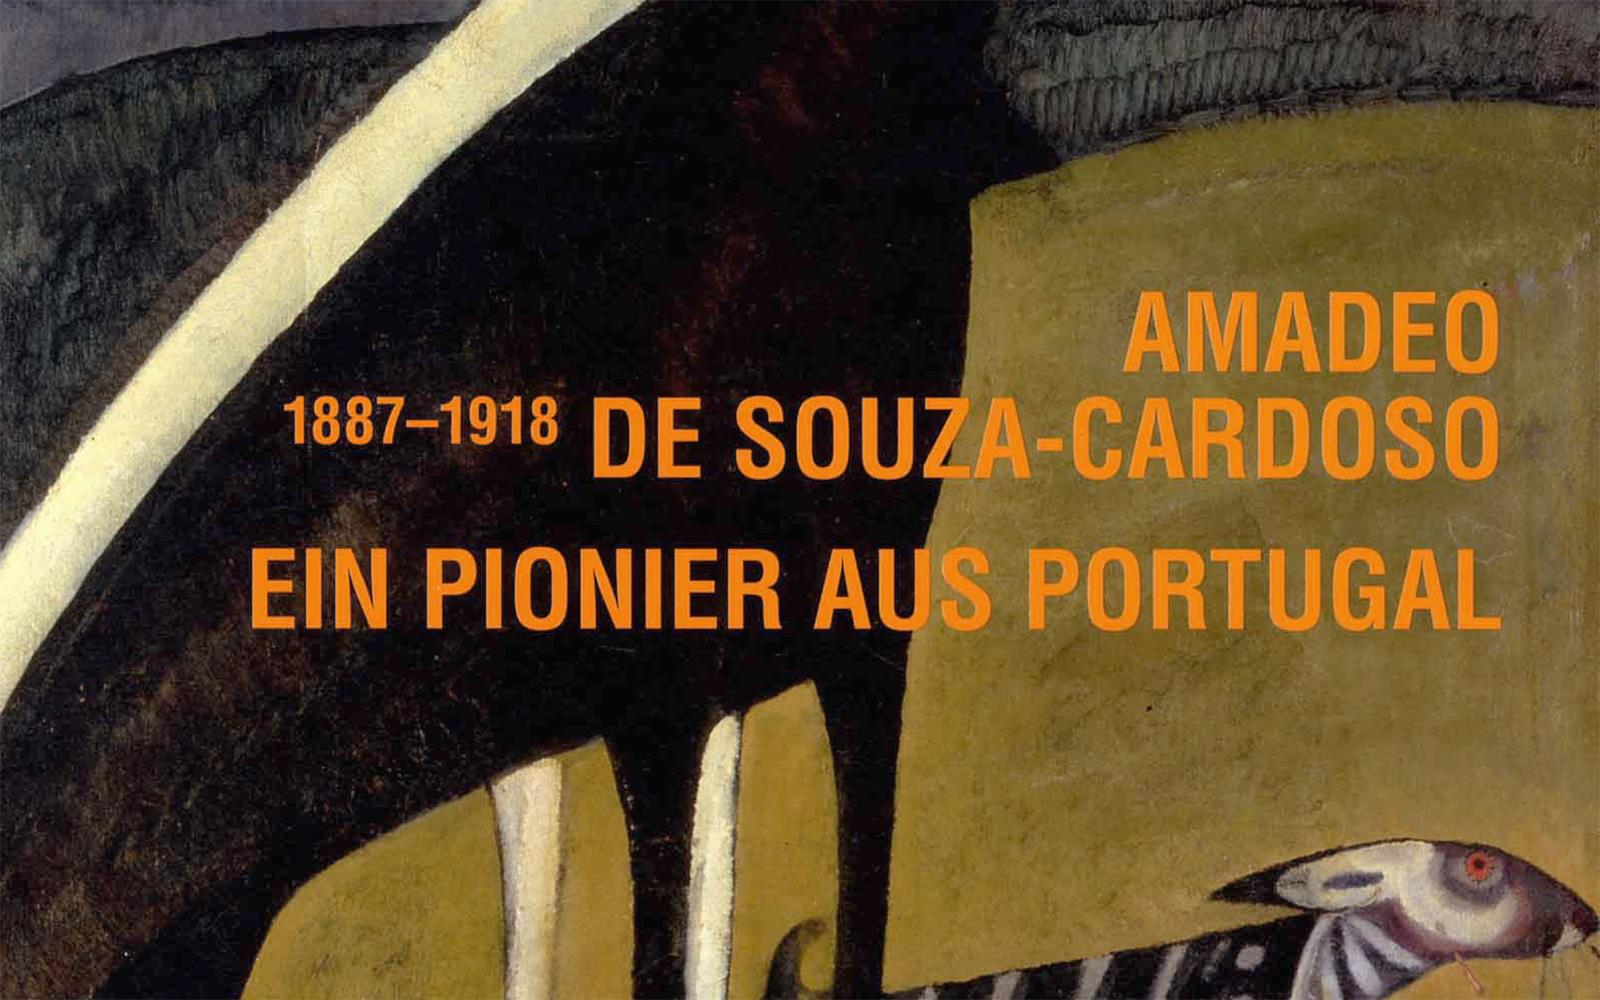 Amadeo de Souza-Cardoso (1887 – 1918). Ein Pionier aus Portugal